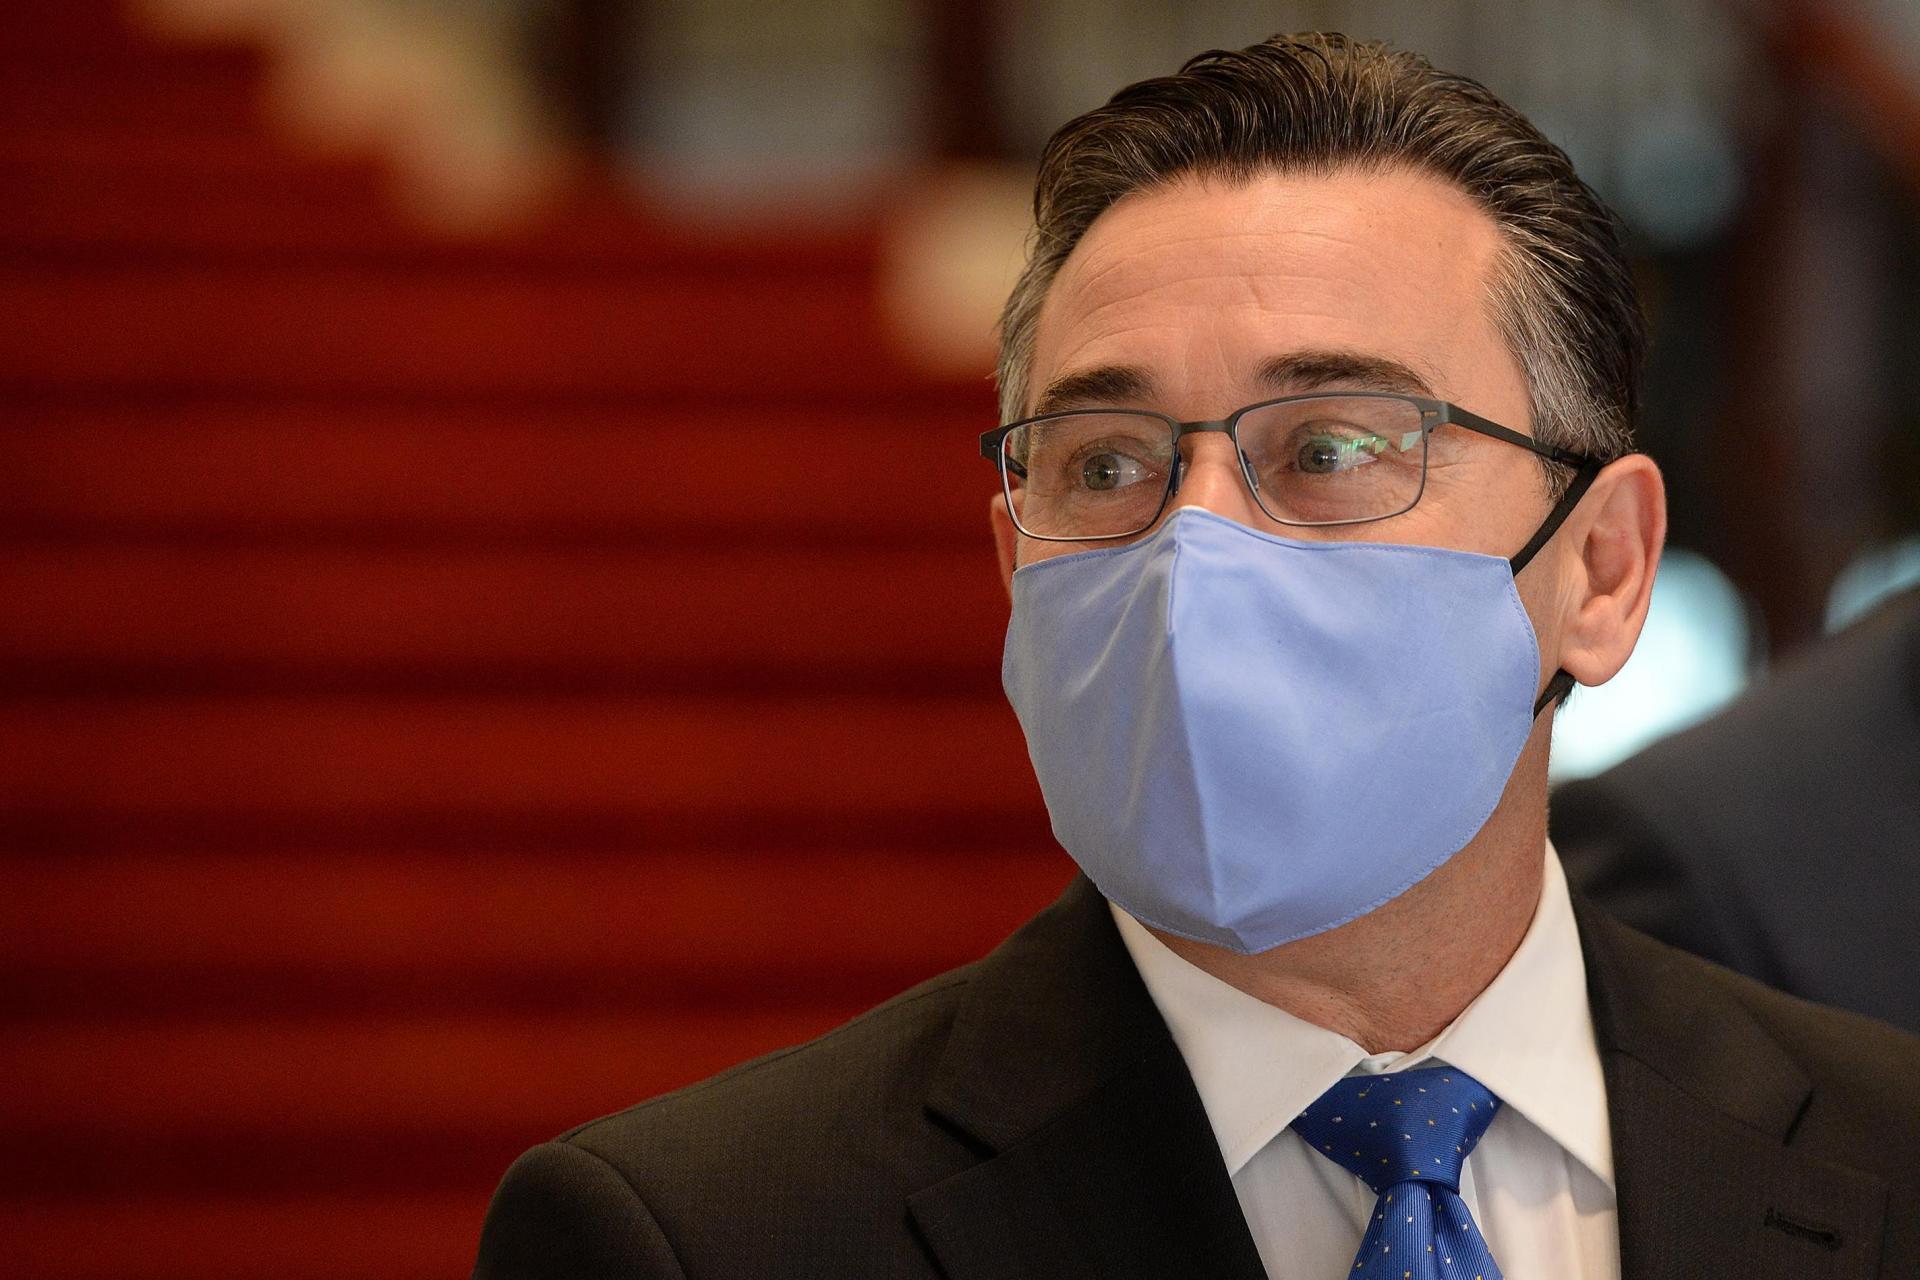 Opposition leader Bernard Grech declared just €5,800 in the bank. Photo: Matthew Mirabelli